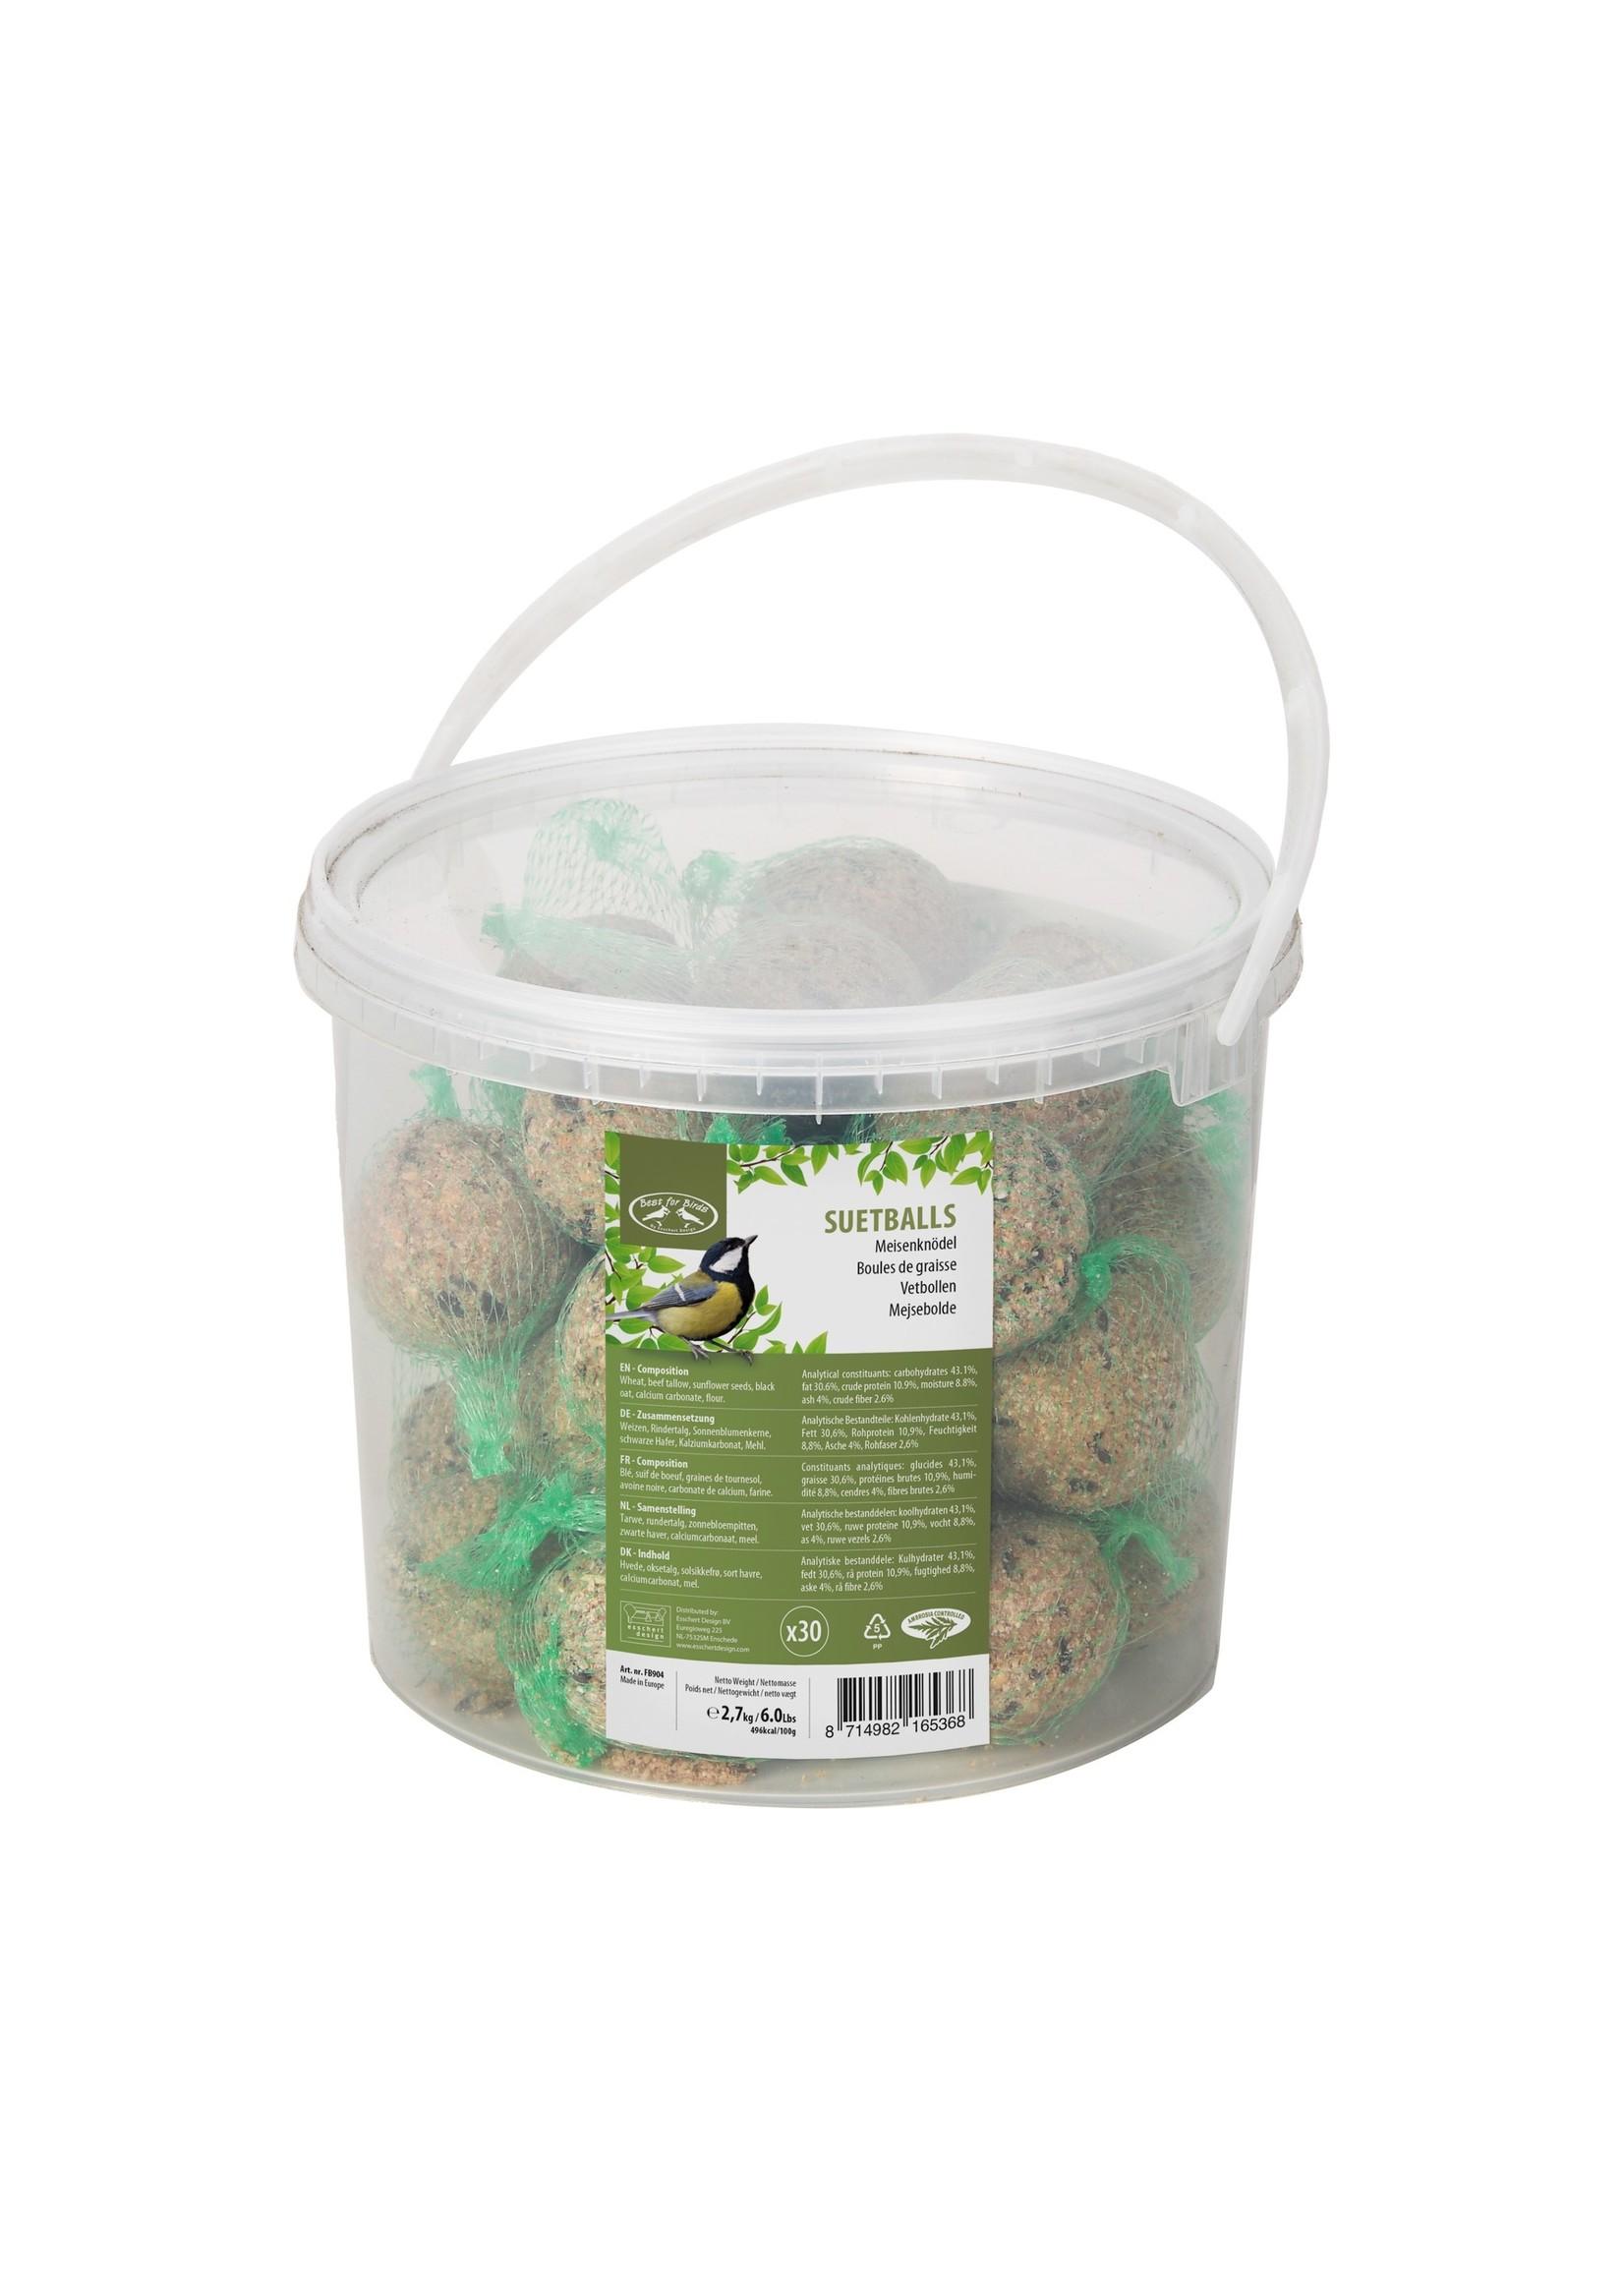 Suetballs 30pcs in Bucket